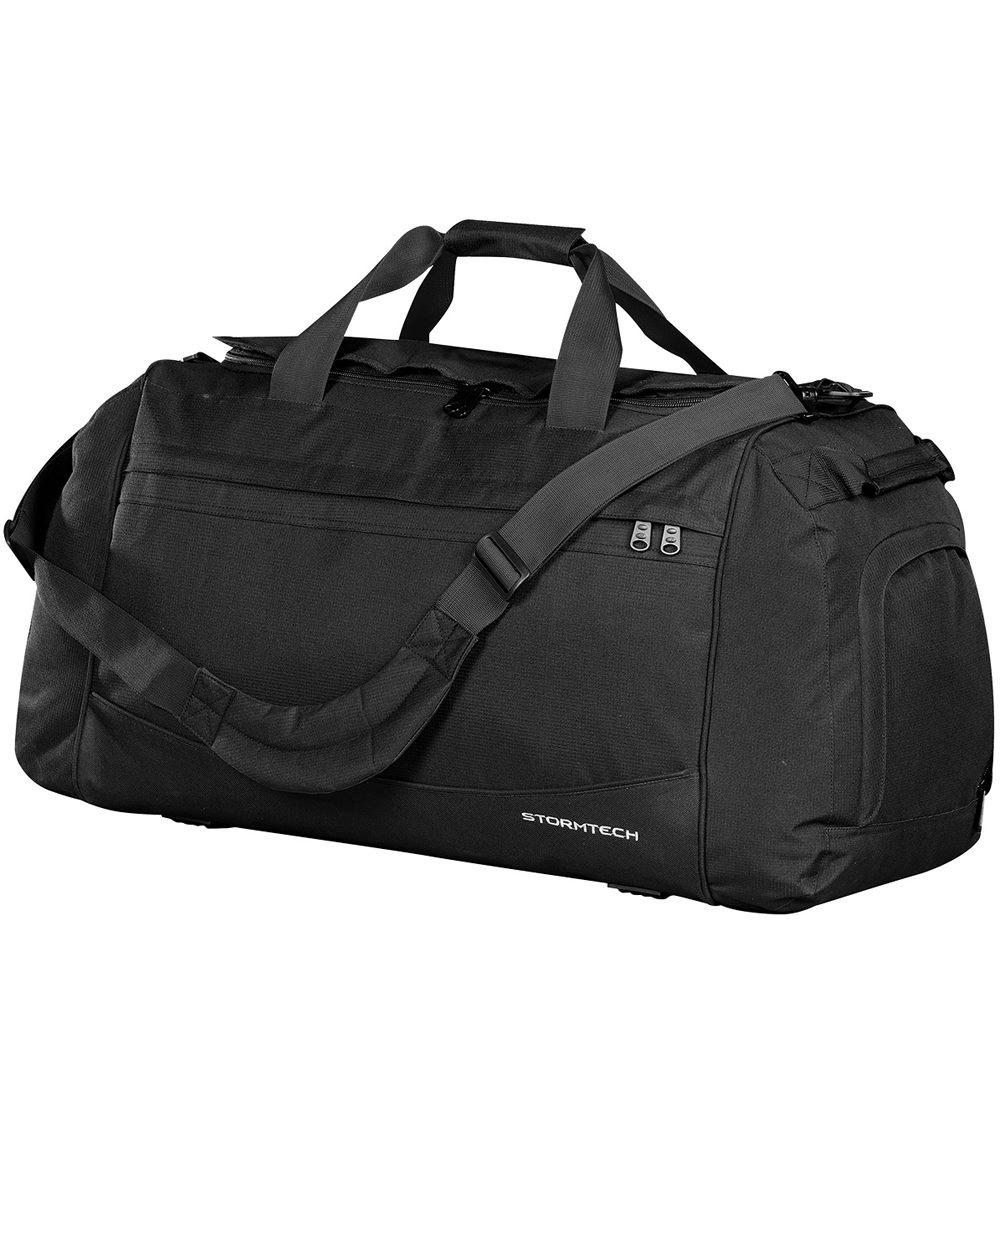 Stormtech CRX-3 - Minstral 97L Crew Bag